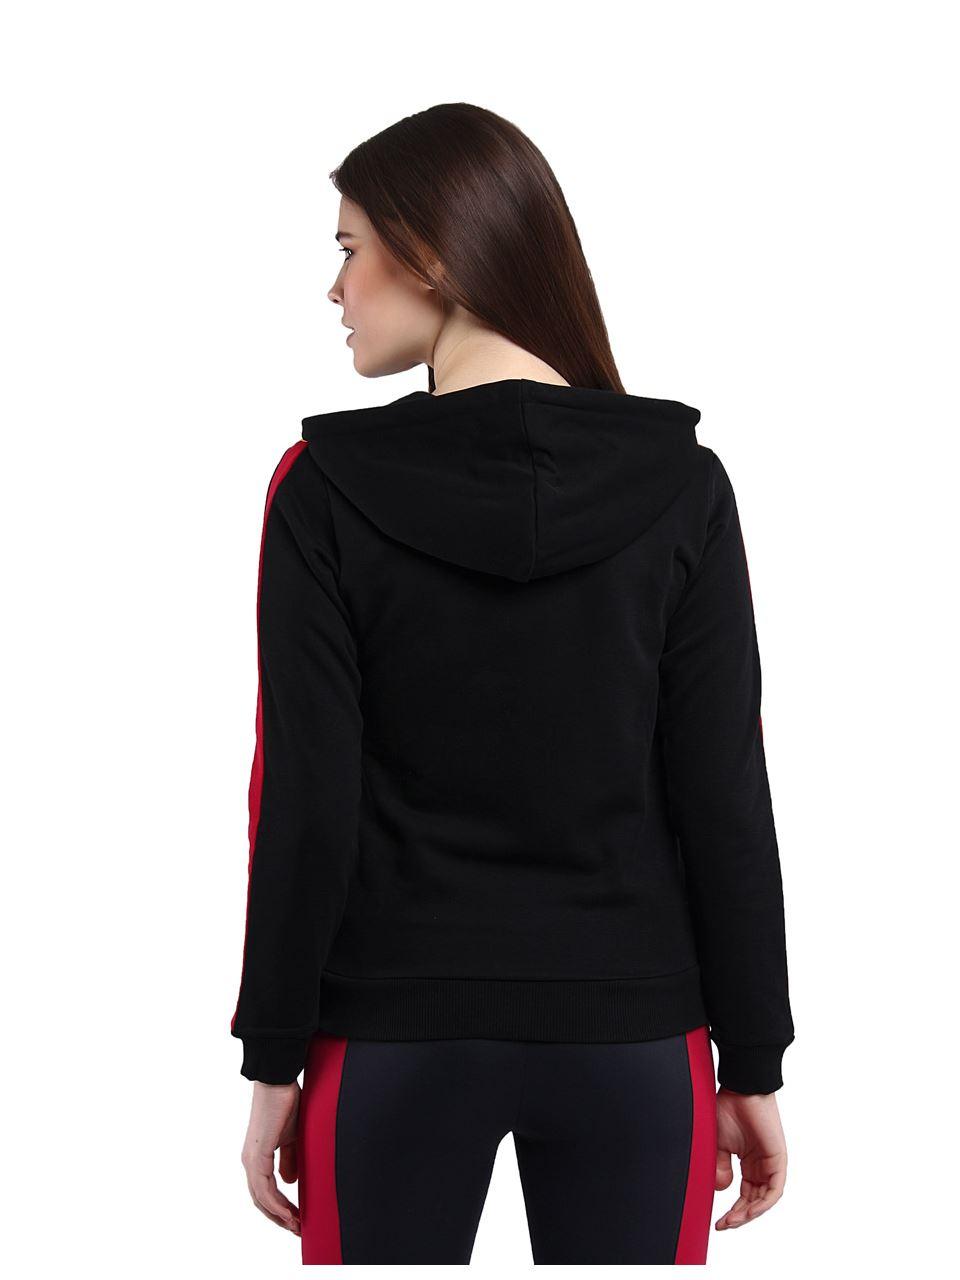 Galatasaray Kadın Sweatshirt K201135